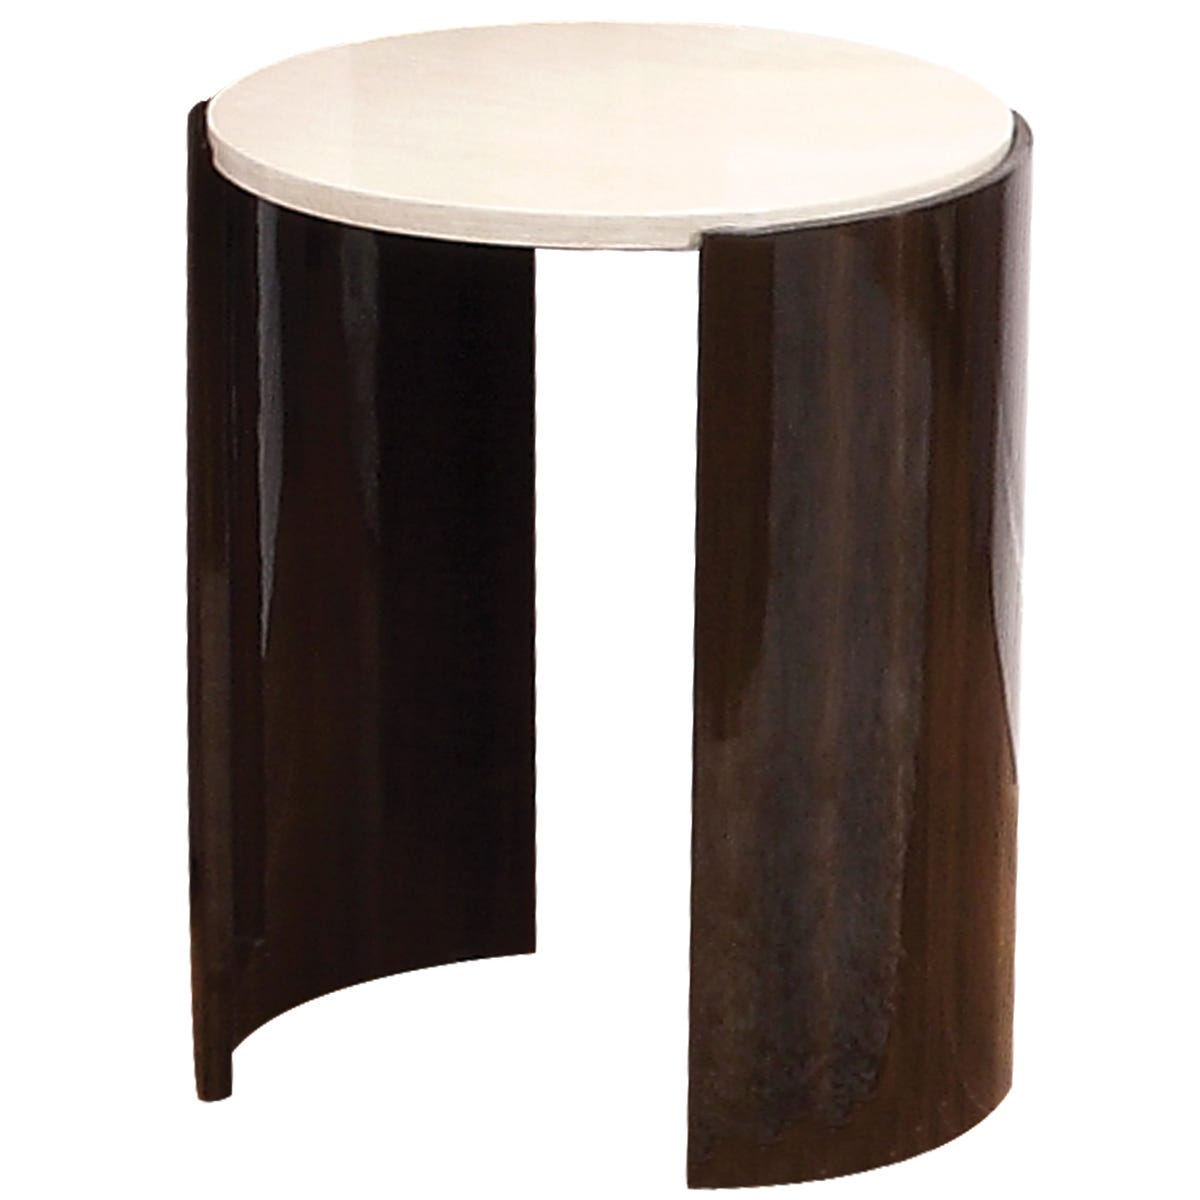 Jual Milan Walnut High Gloss Lamp Table - Small